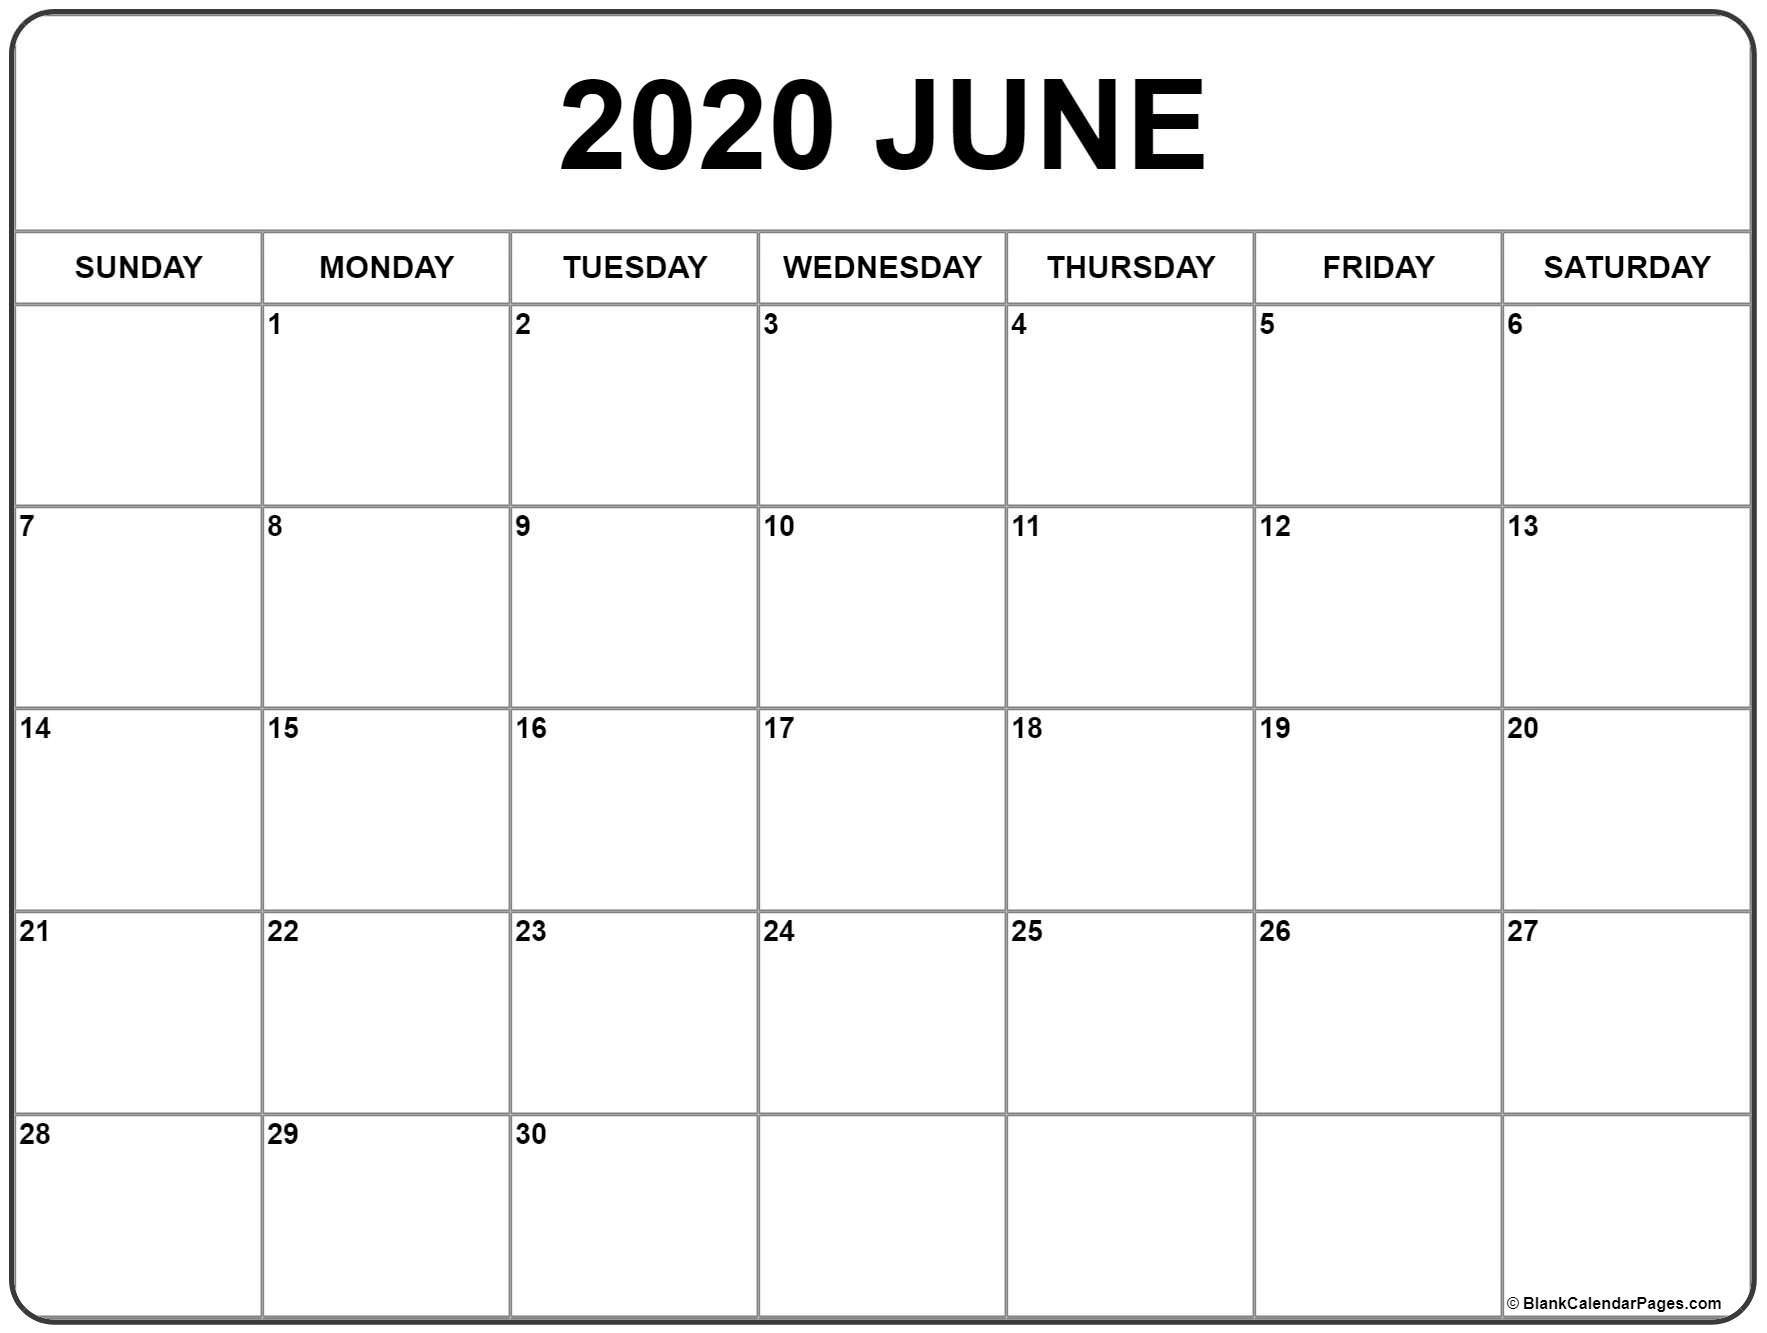 This Month S Featured Calendars Get It Today At Https Ift Tt 2sjcjhd In 2020 Monthly Calendar Printable Calendar Printables Free Printable Calendar